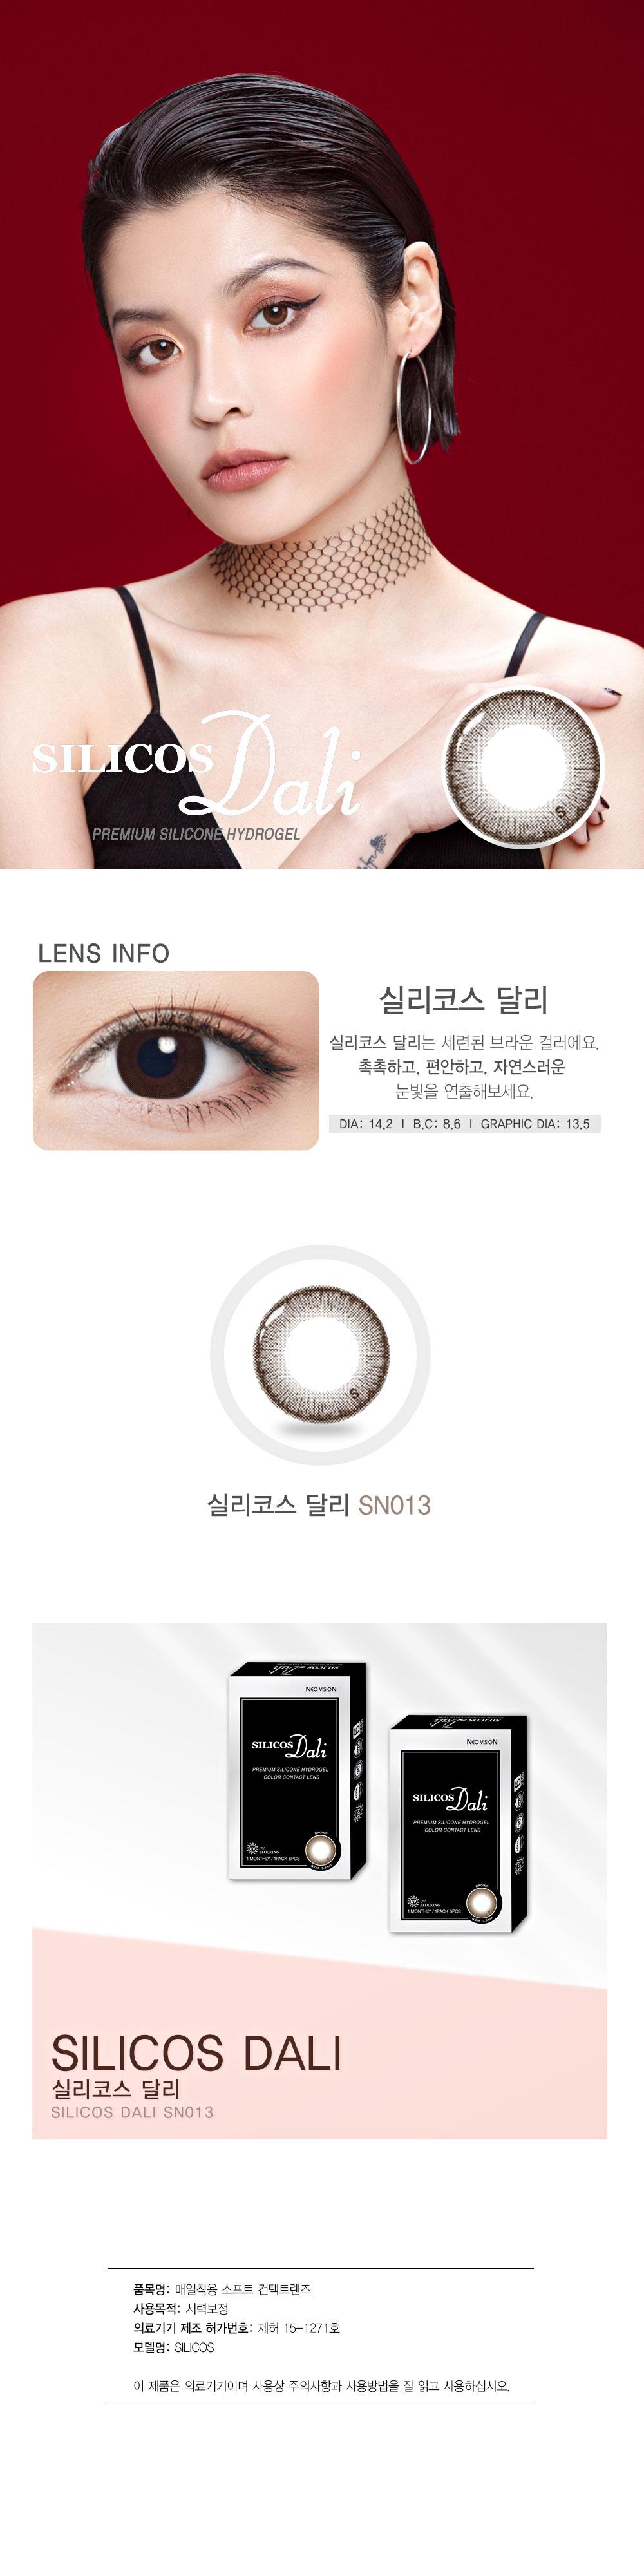 silicos-dali-korean-colored-lenses.jpg